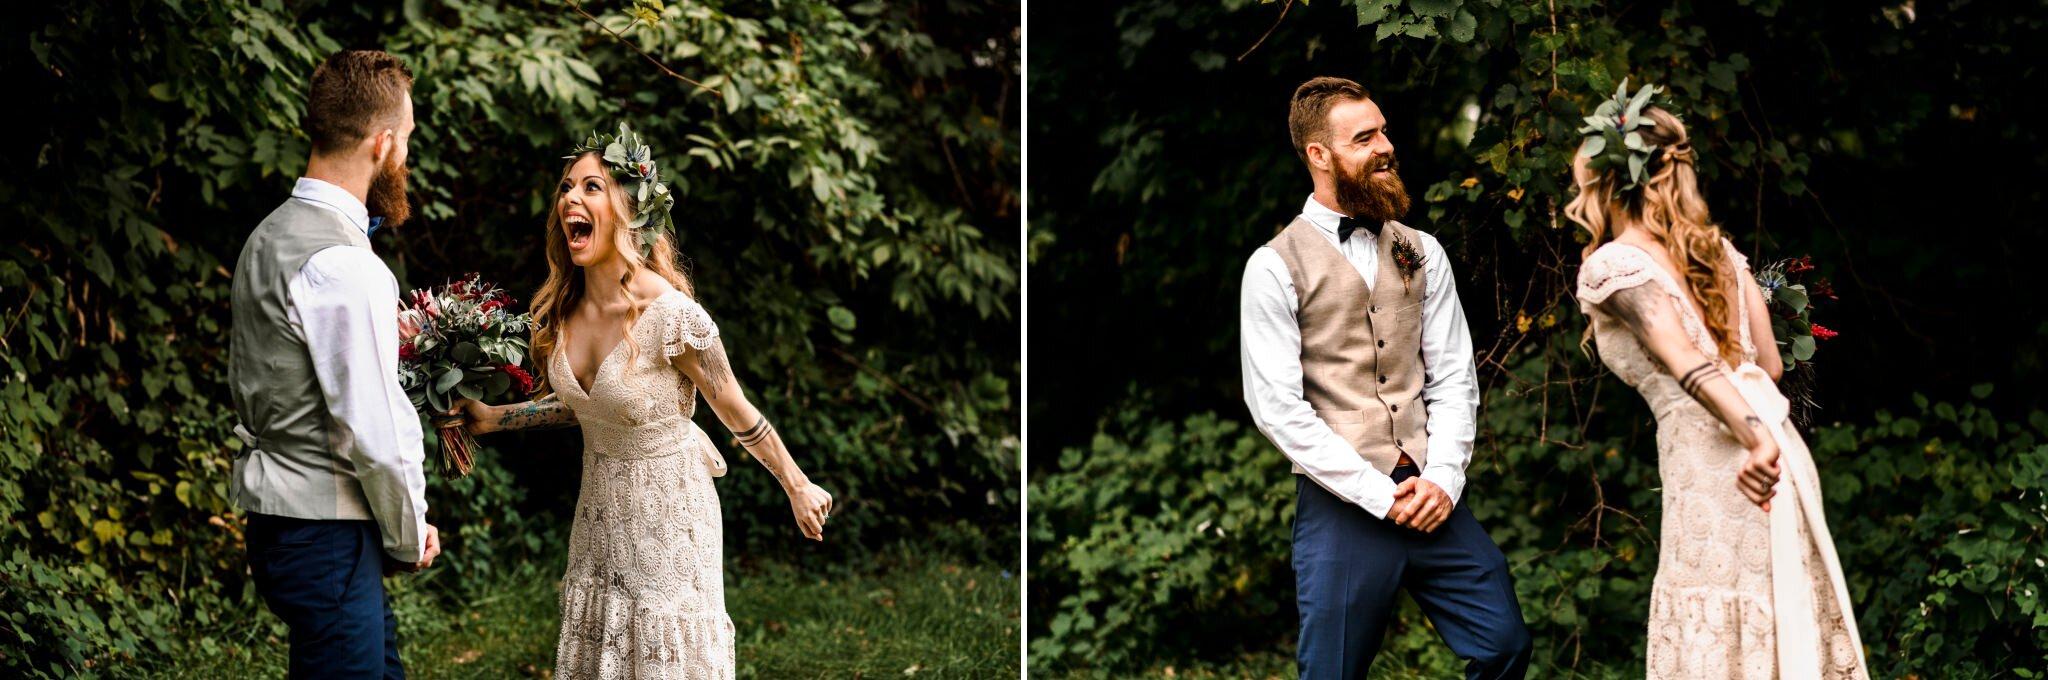 Hoffman-618-New-Jersey-Wedding-Photographer-57.JPG